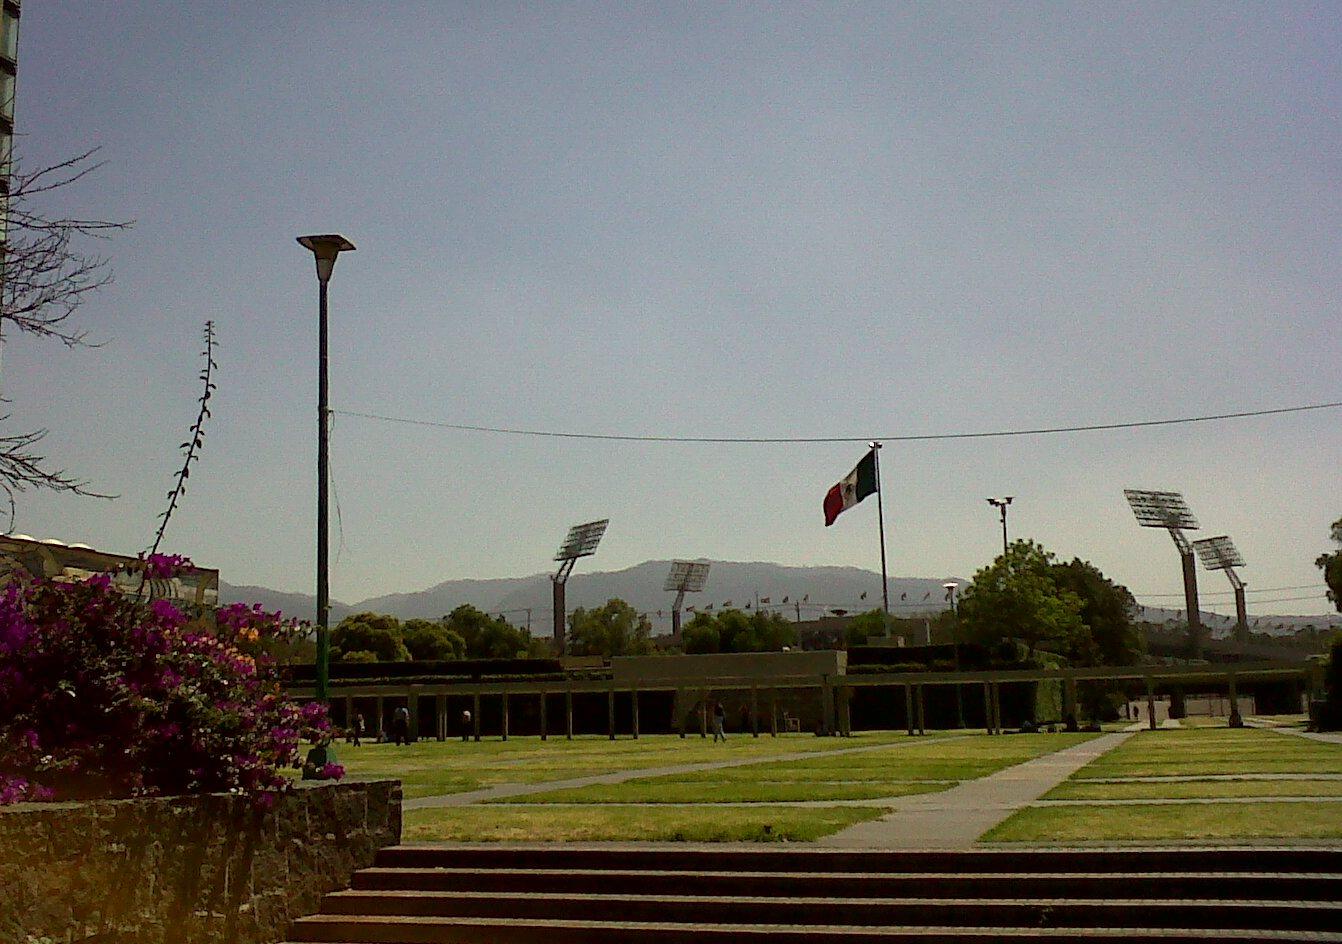 Ciudad Universitaria uñtawi, kawkhantix jan walt'awix paski ukhawa. Luririn jamuqapa, J. Tade (mayo 2012).